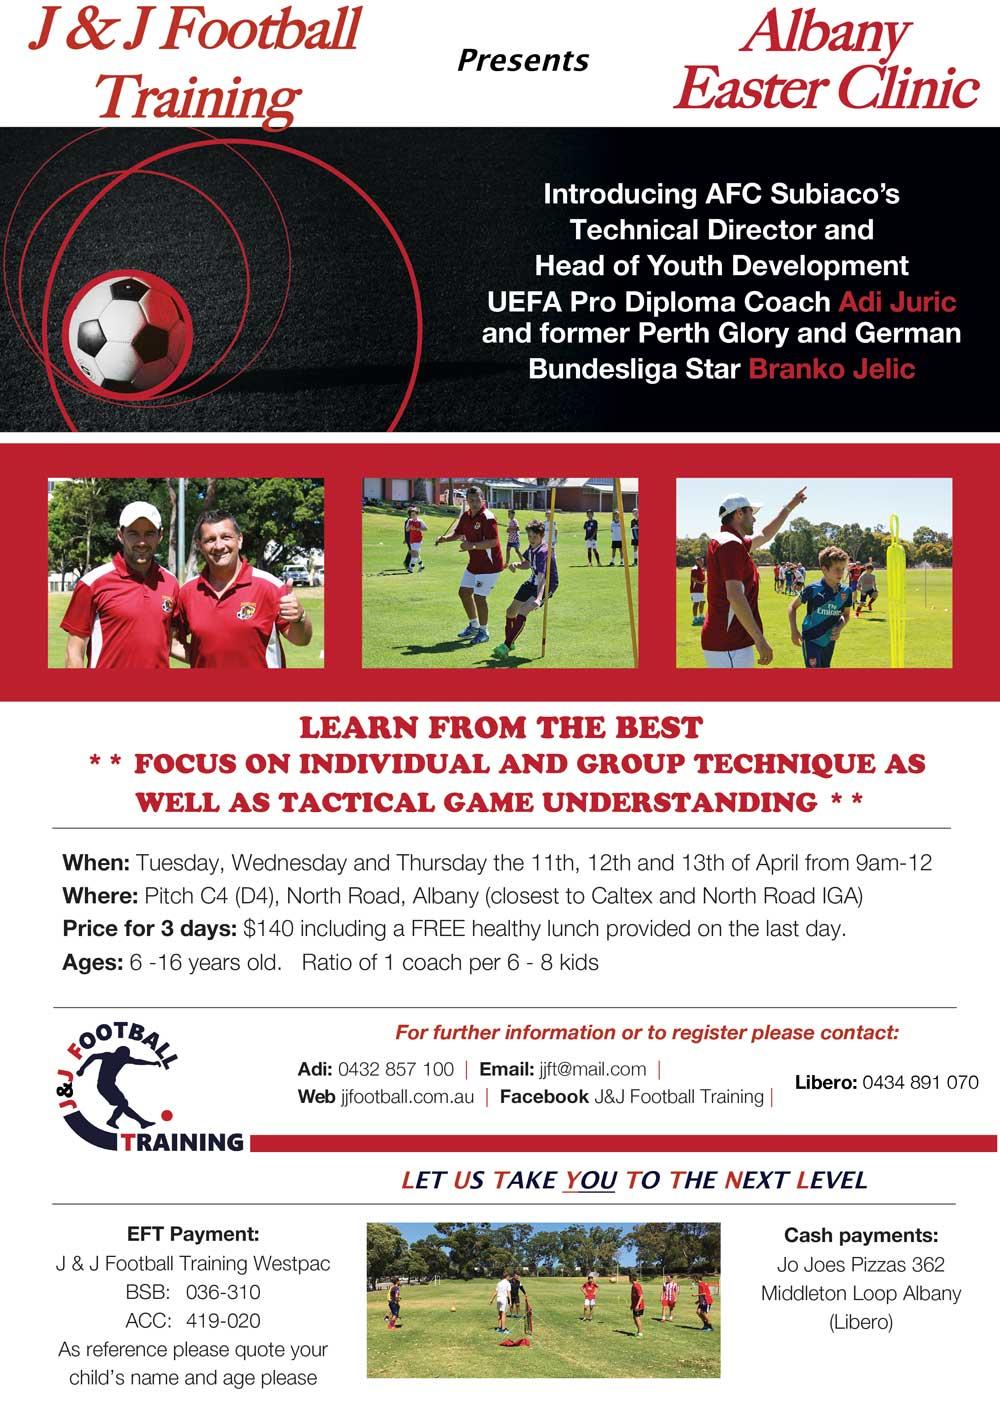 J&J Easter Football clinic in Albany – J&J Football Training